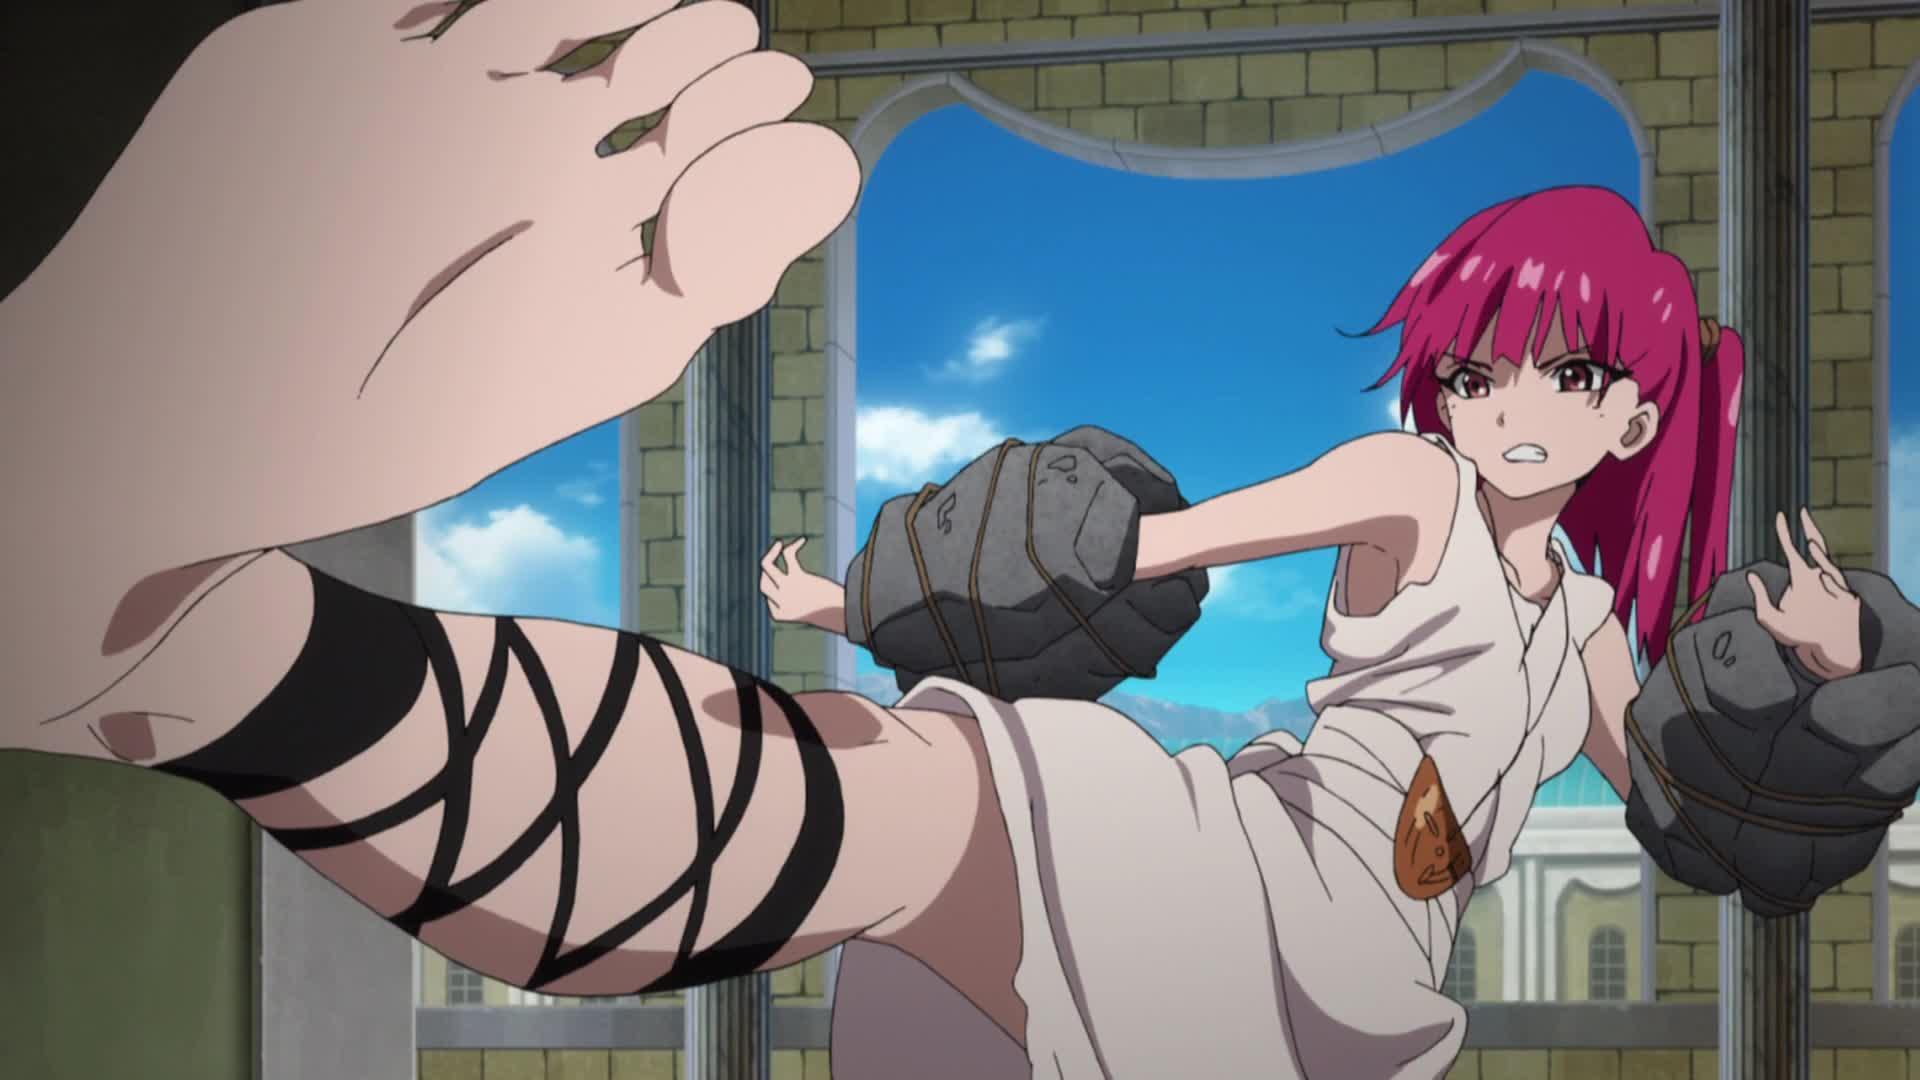 Fairie anal anime erotica scene